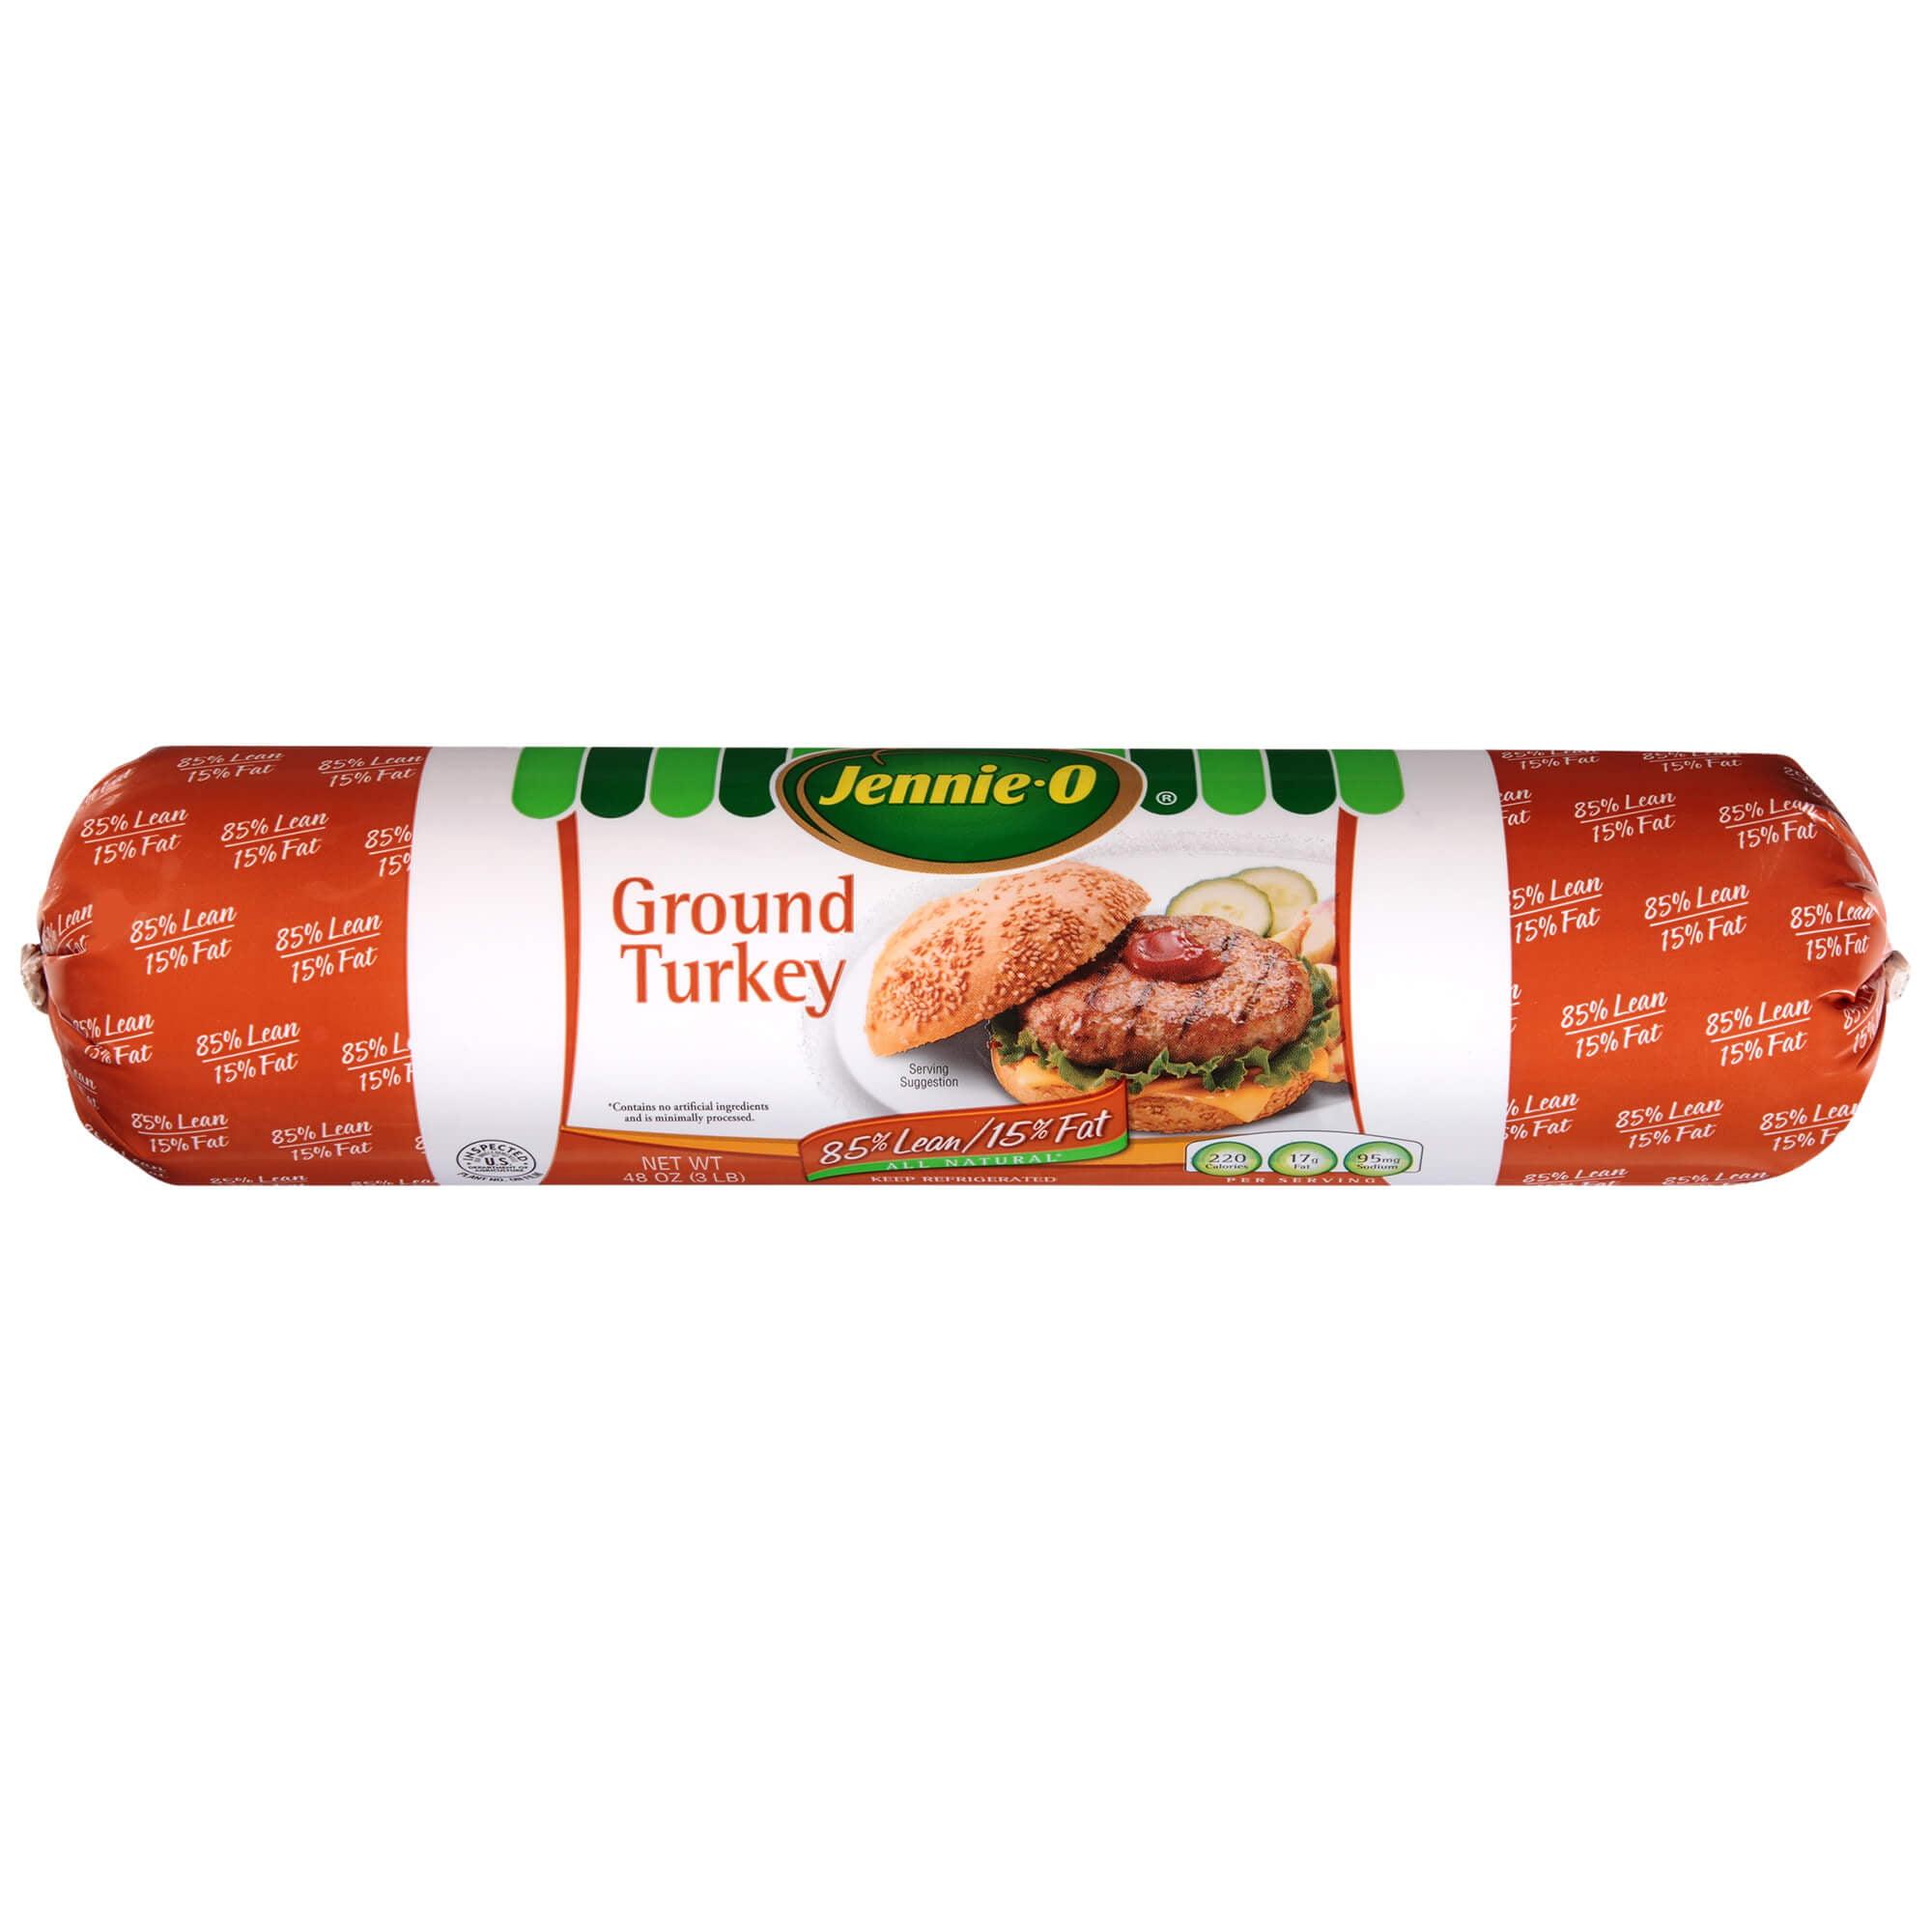 Jennie-O Ground Turkey Roll, 3 lb